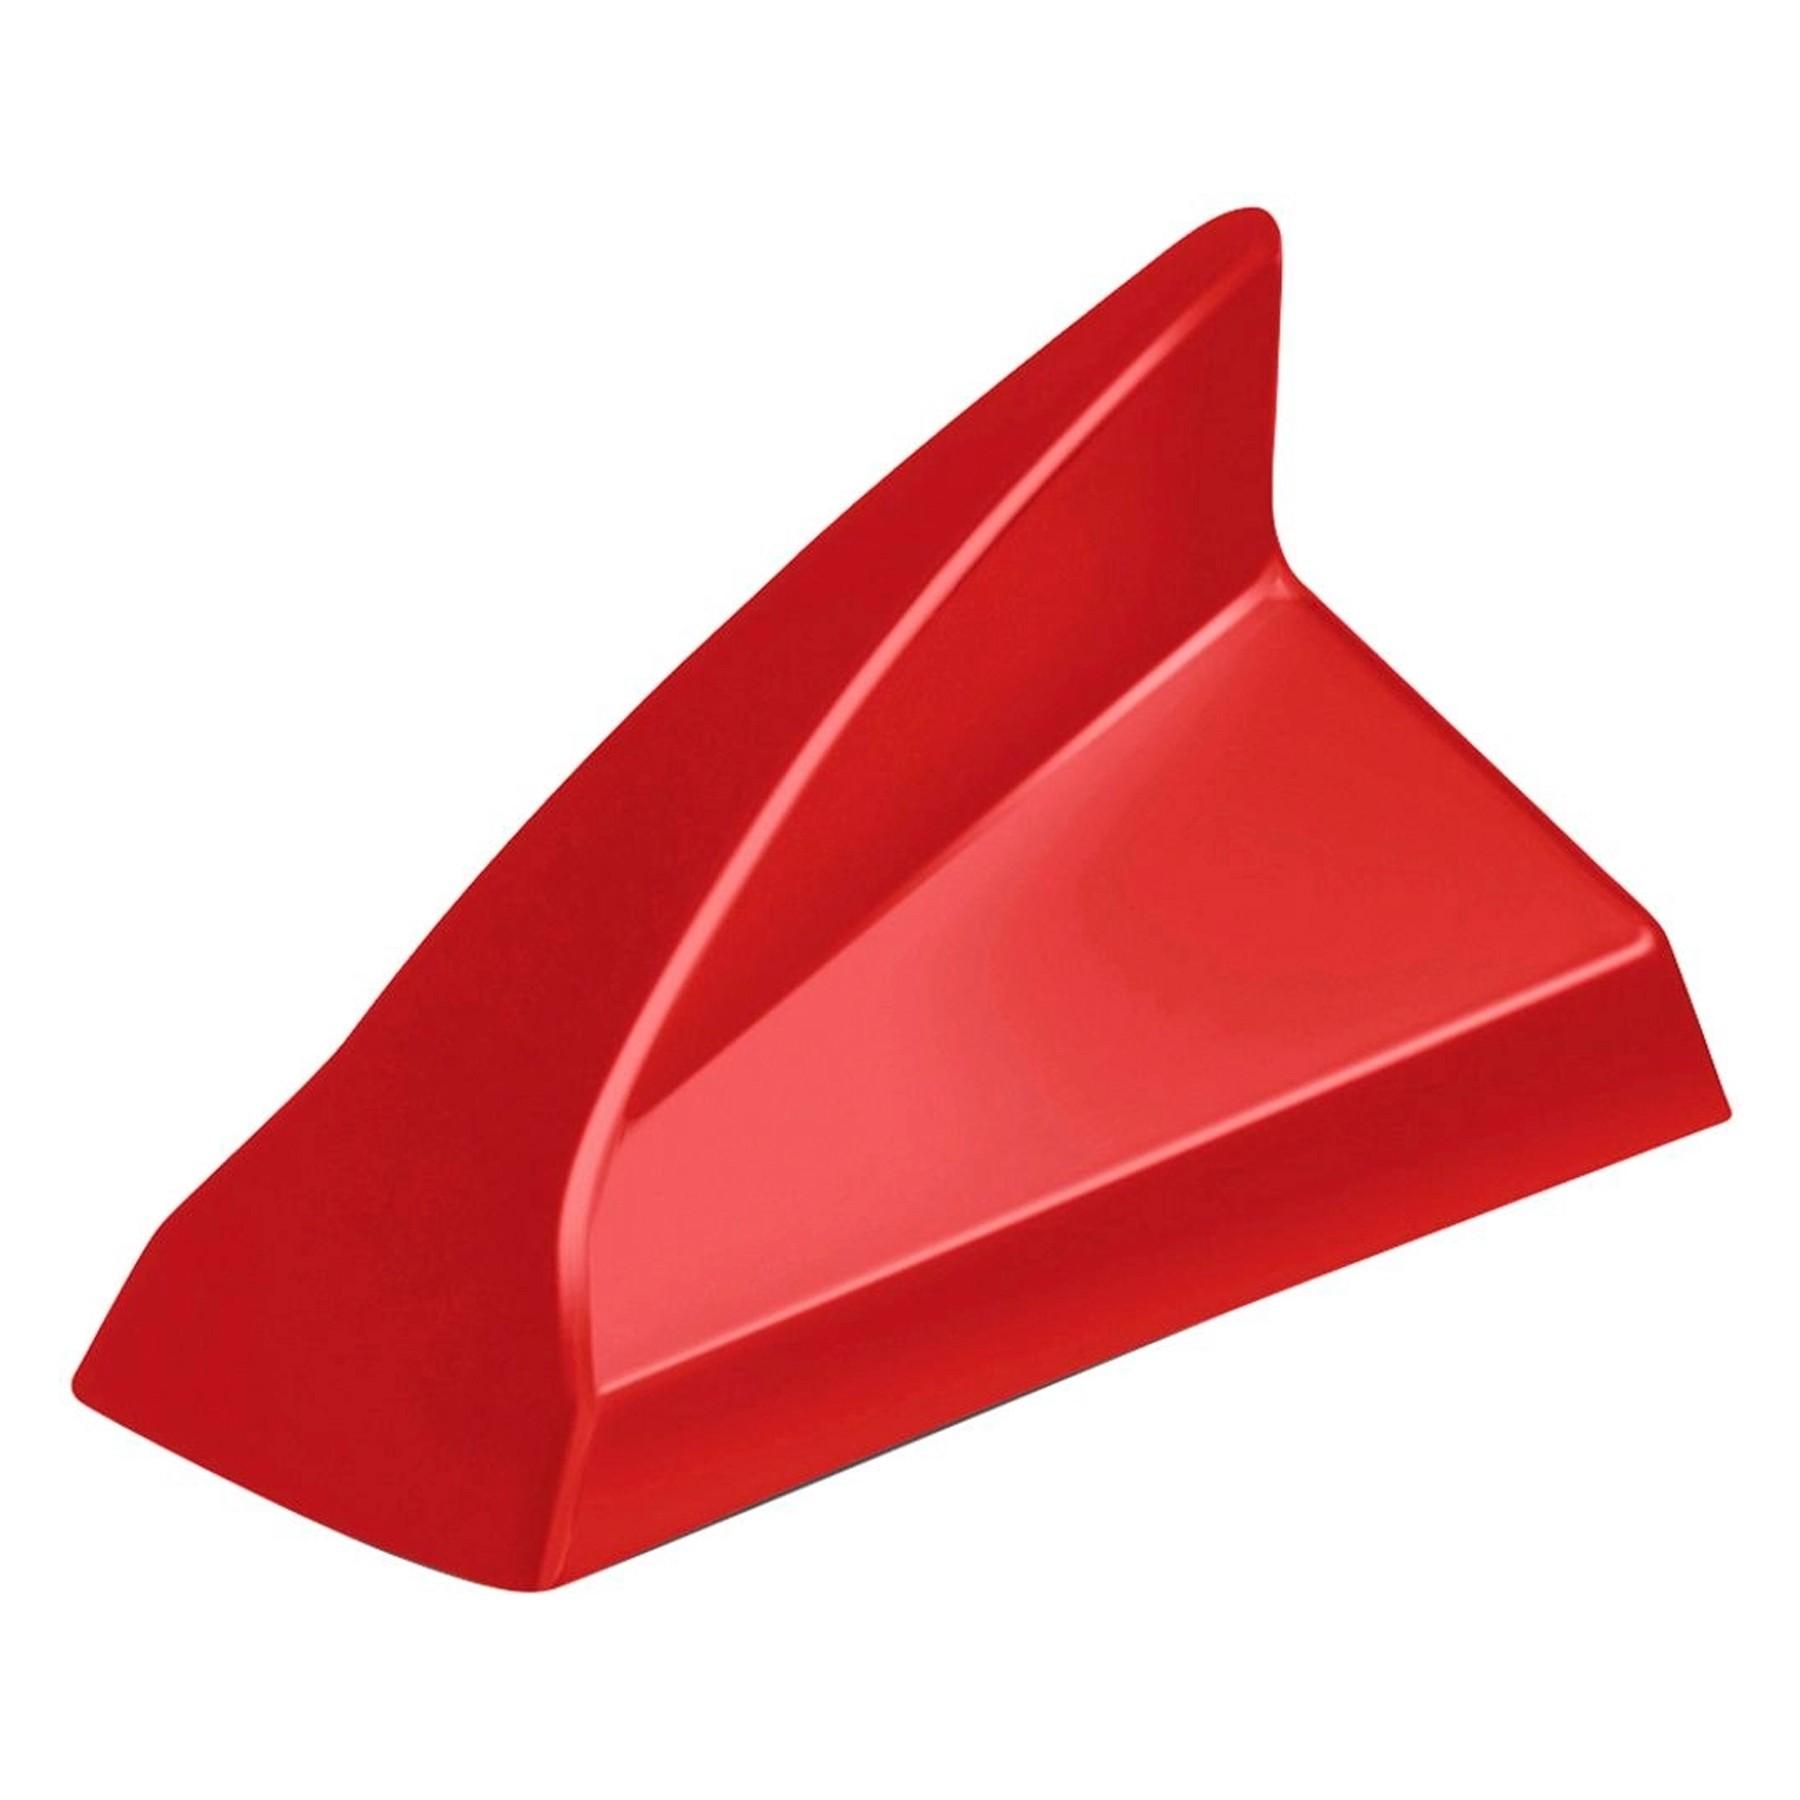 Antena Decorativa - Shark (Vermelha)